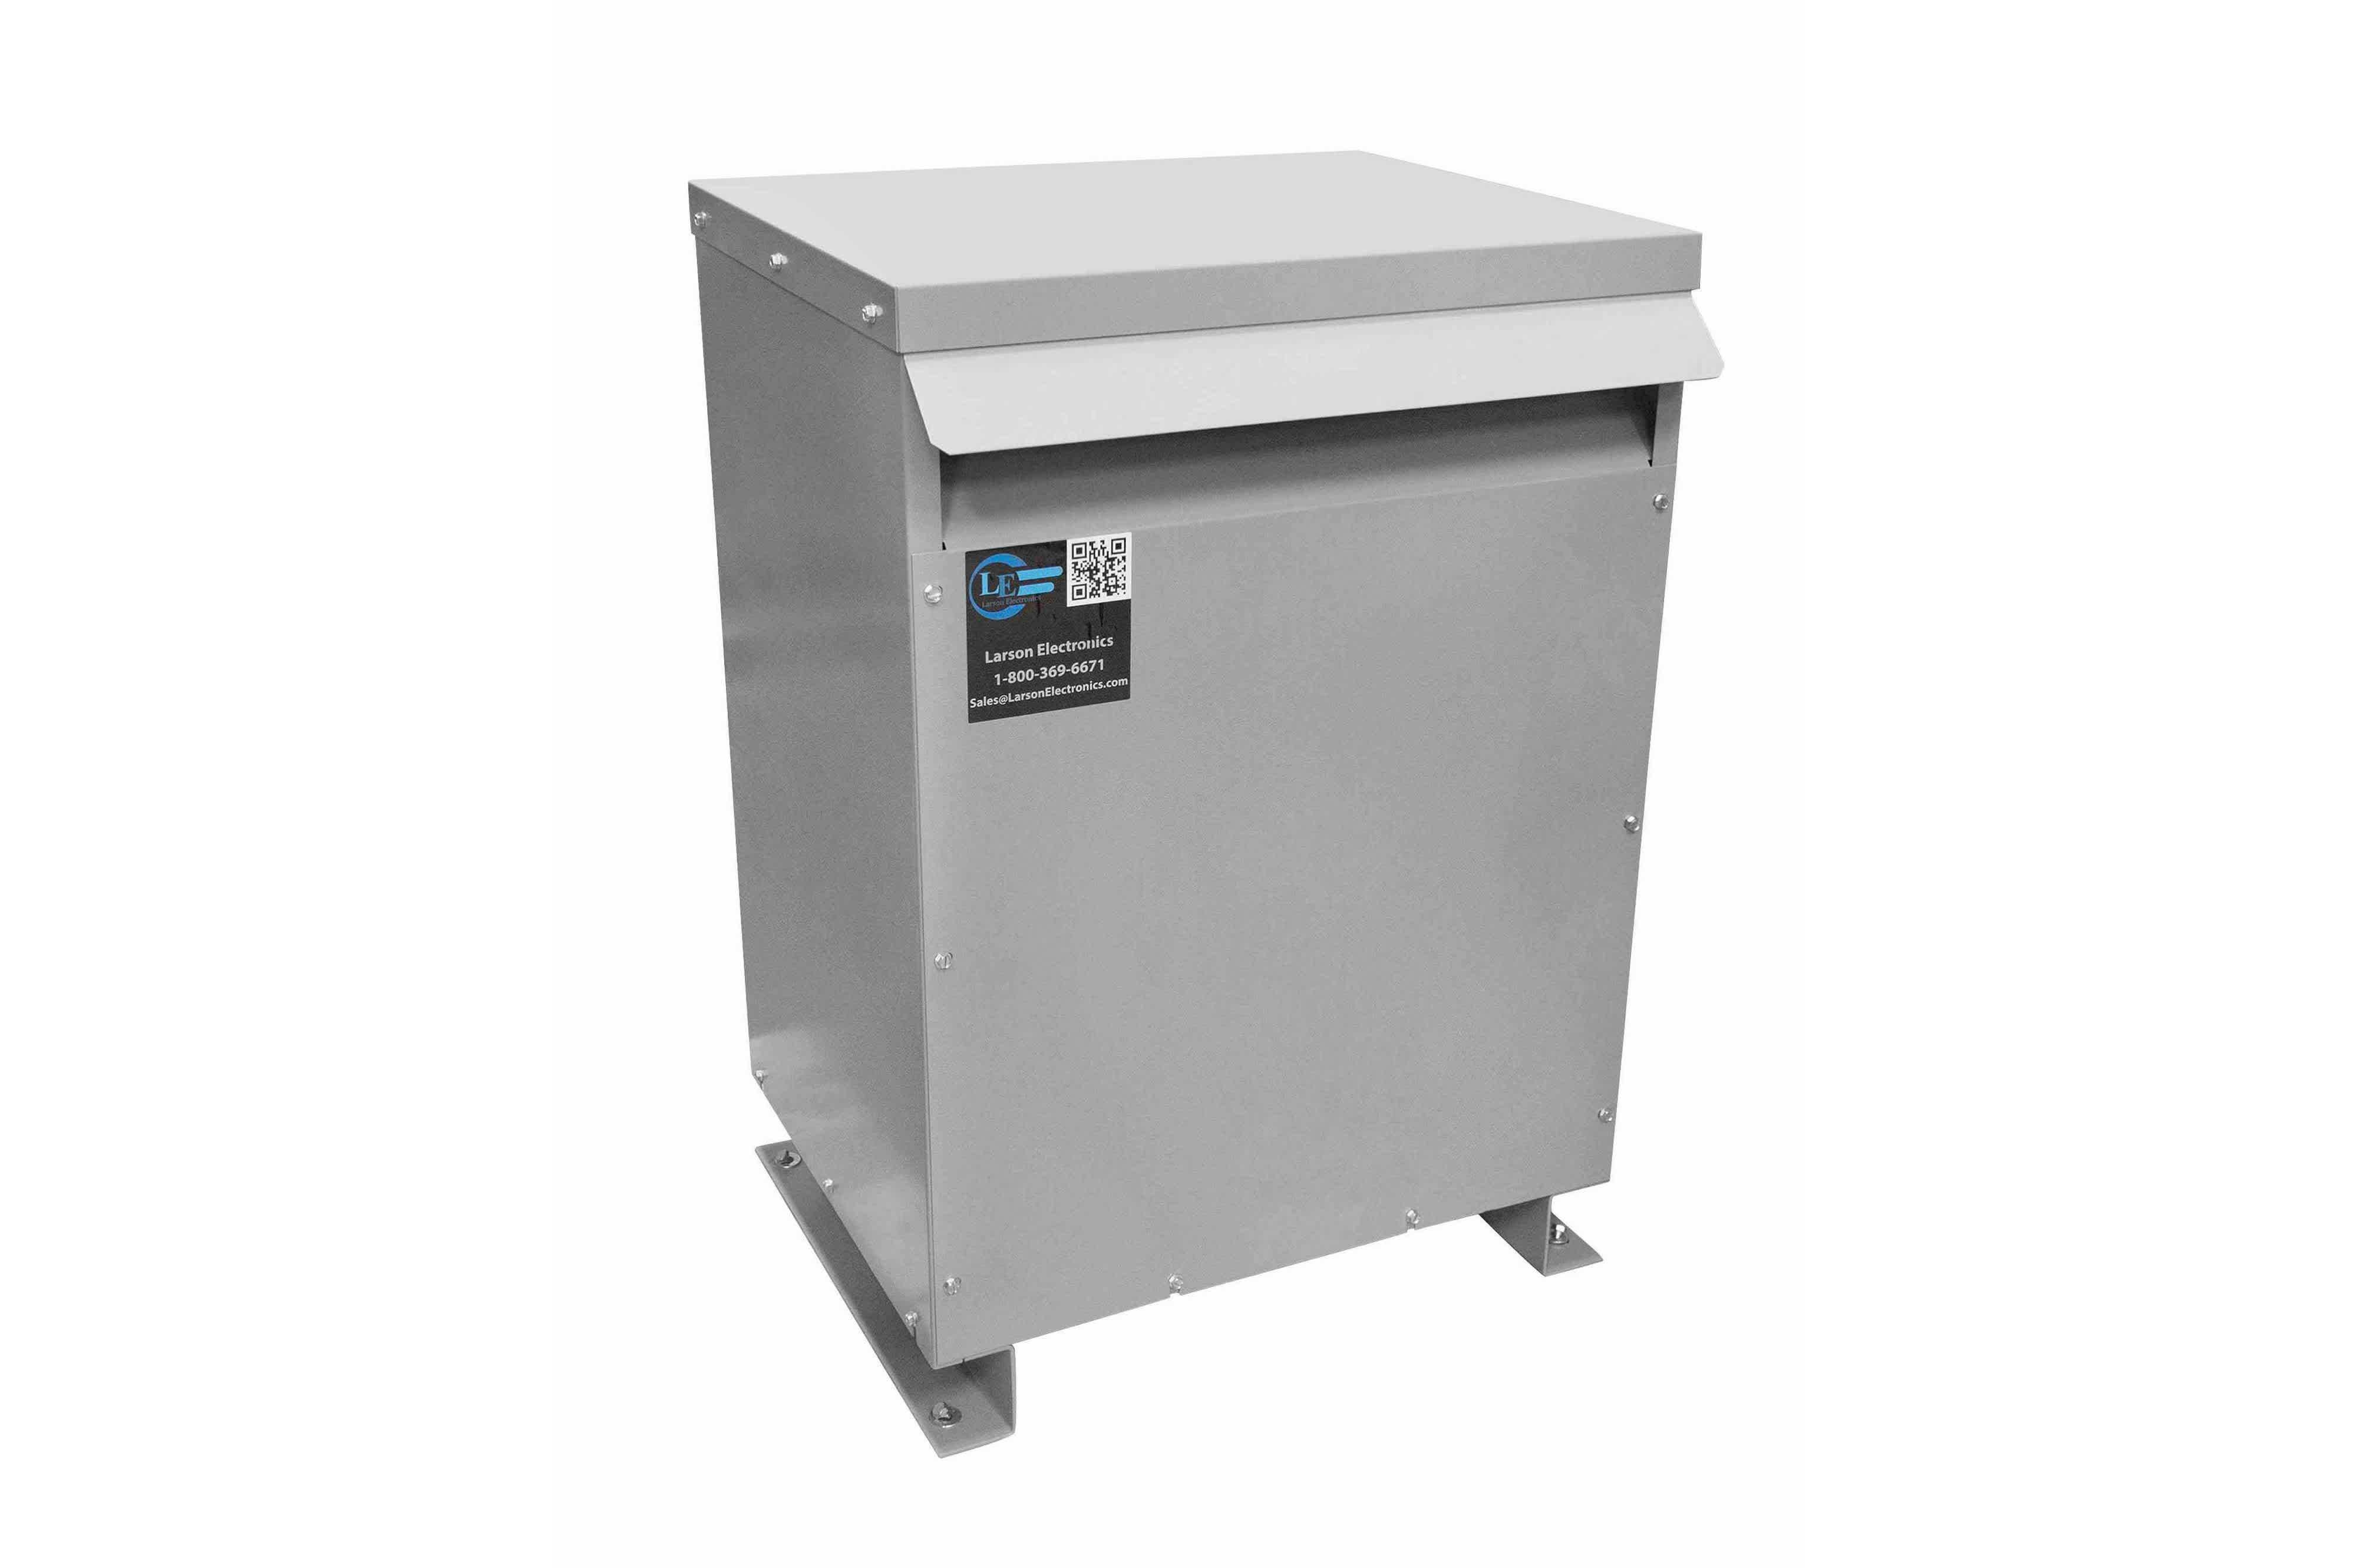 250 kVA 3PH DOE Transformer, 480V Delta Primary, 208Y/120 Wye-N Secondary, N3R, Ventilated, 60 Hz